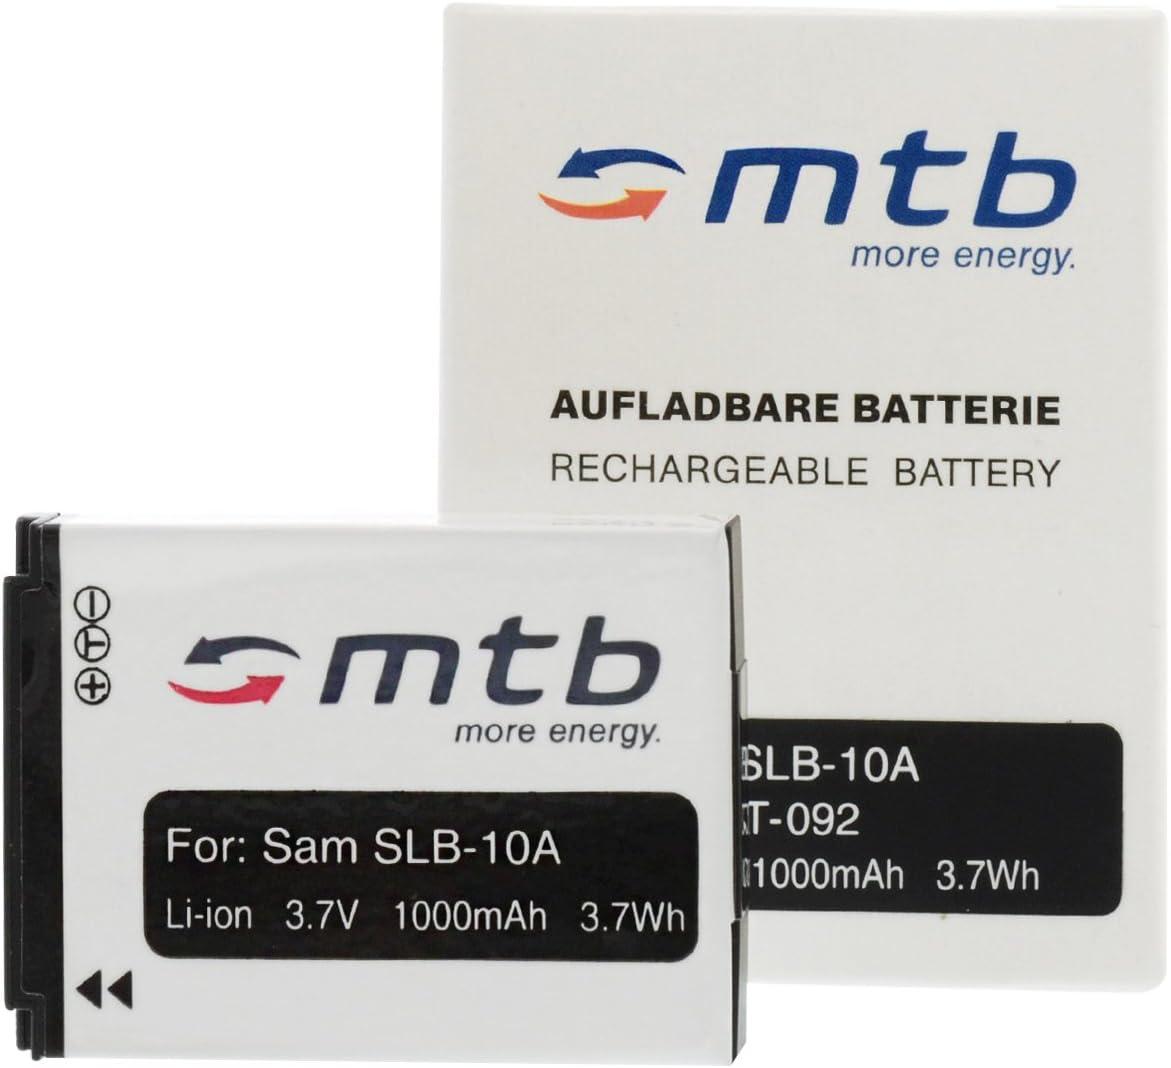 2 Baterías SLB-10A para Samsung ES50, ES55./JVC ADIXXION/Toshiba X ...